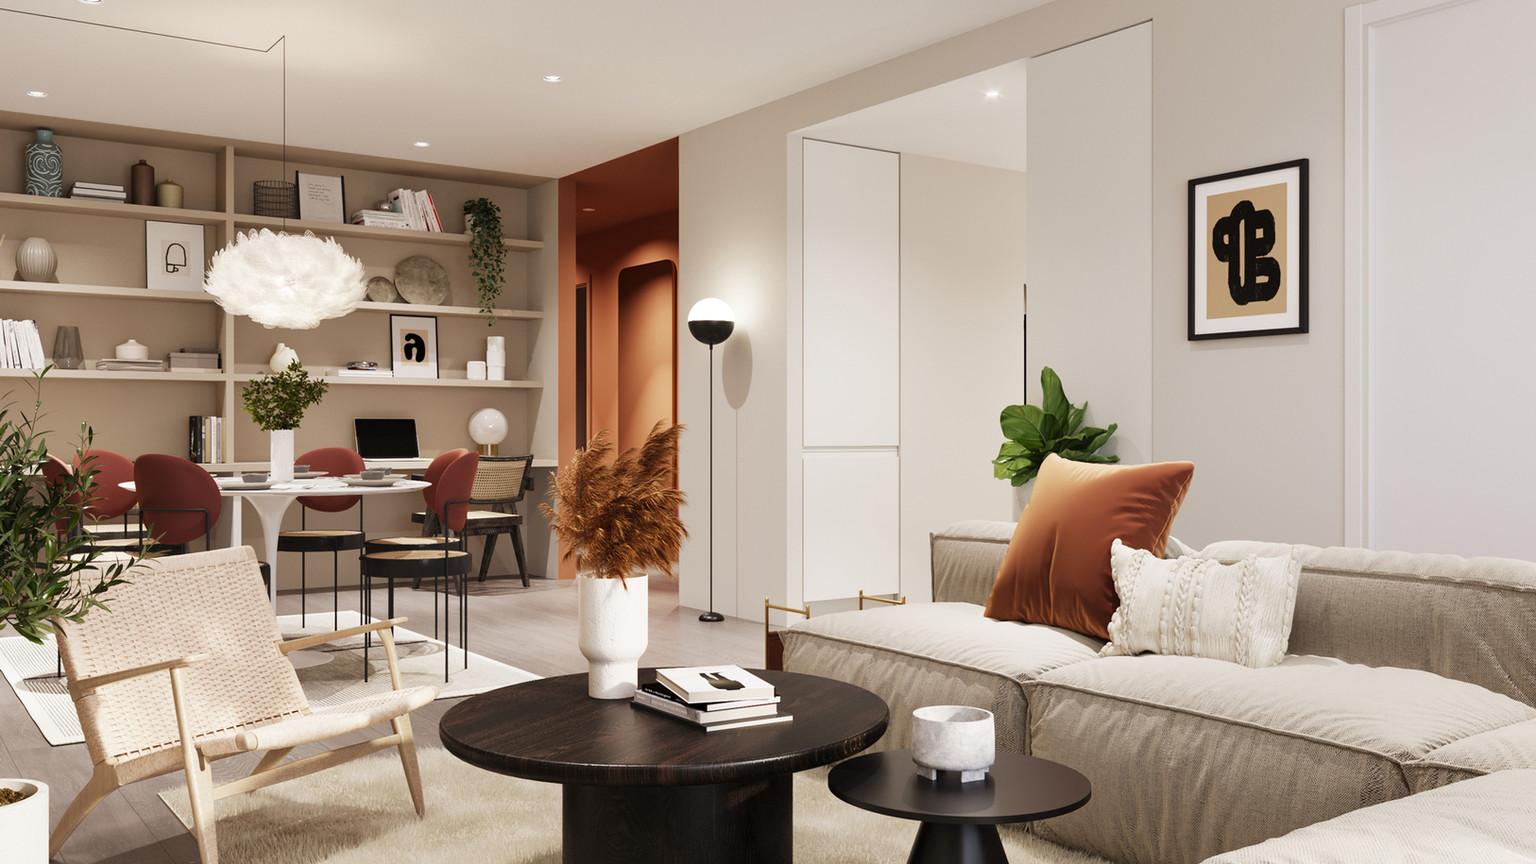 210401_Lazenby-Square_2bedroom-apt_Living-2_LowRes.jpg